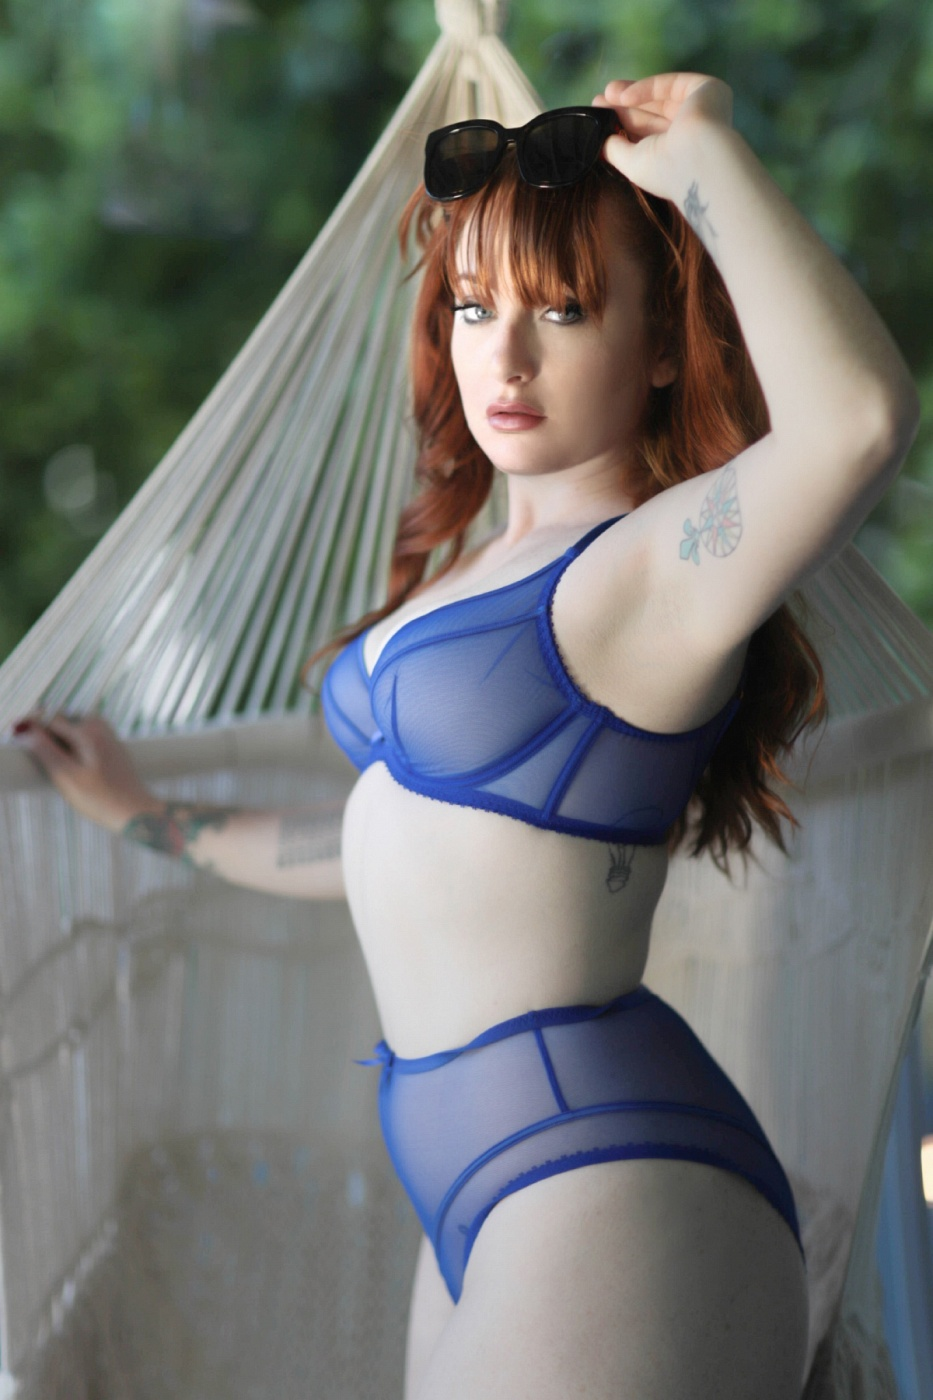 Gemma Paradise